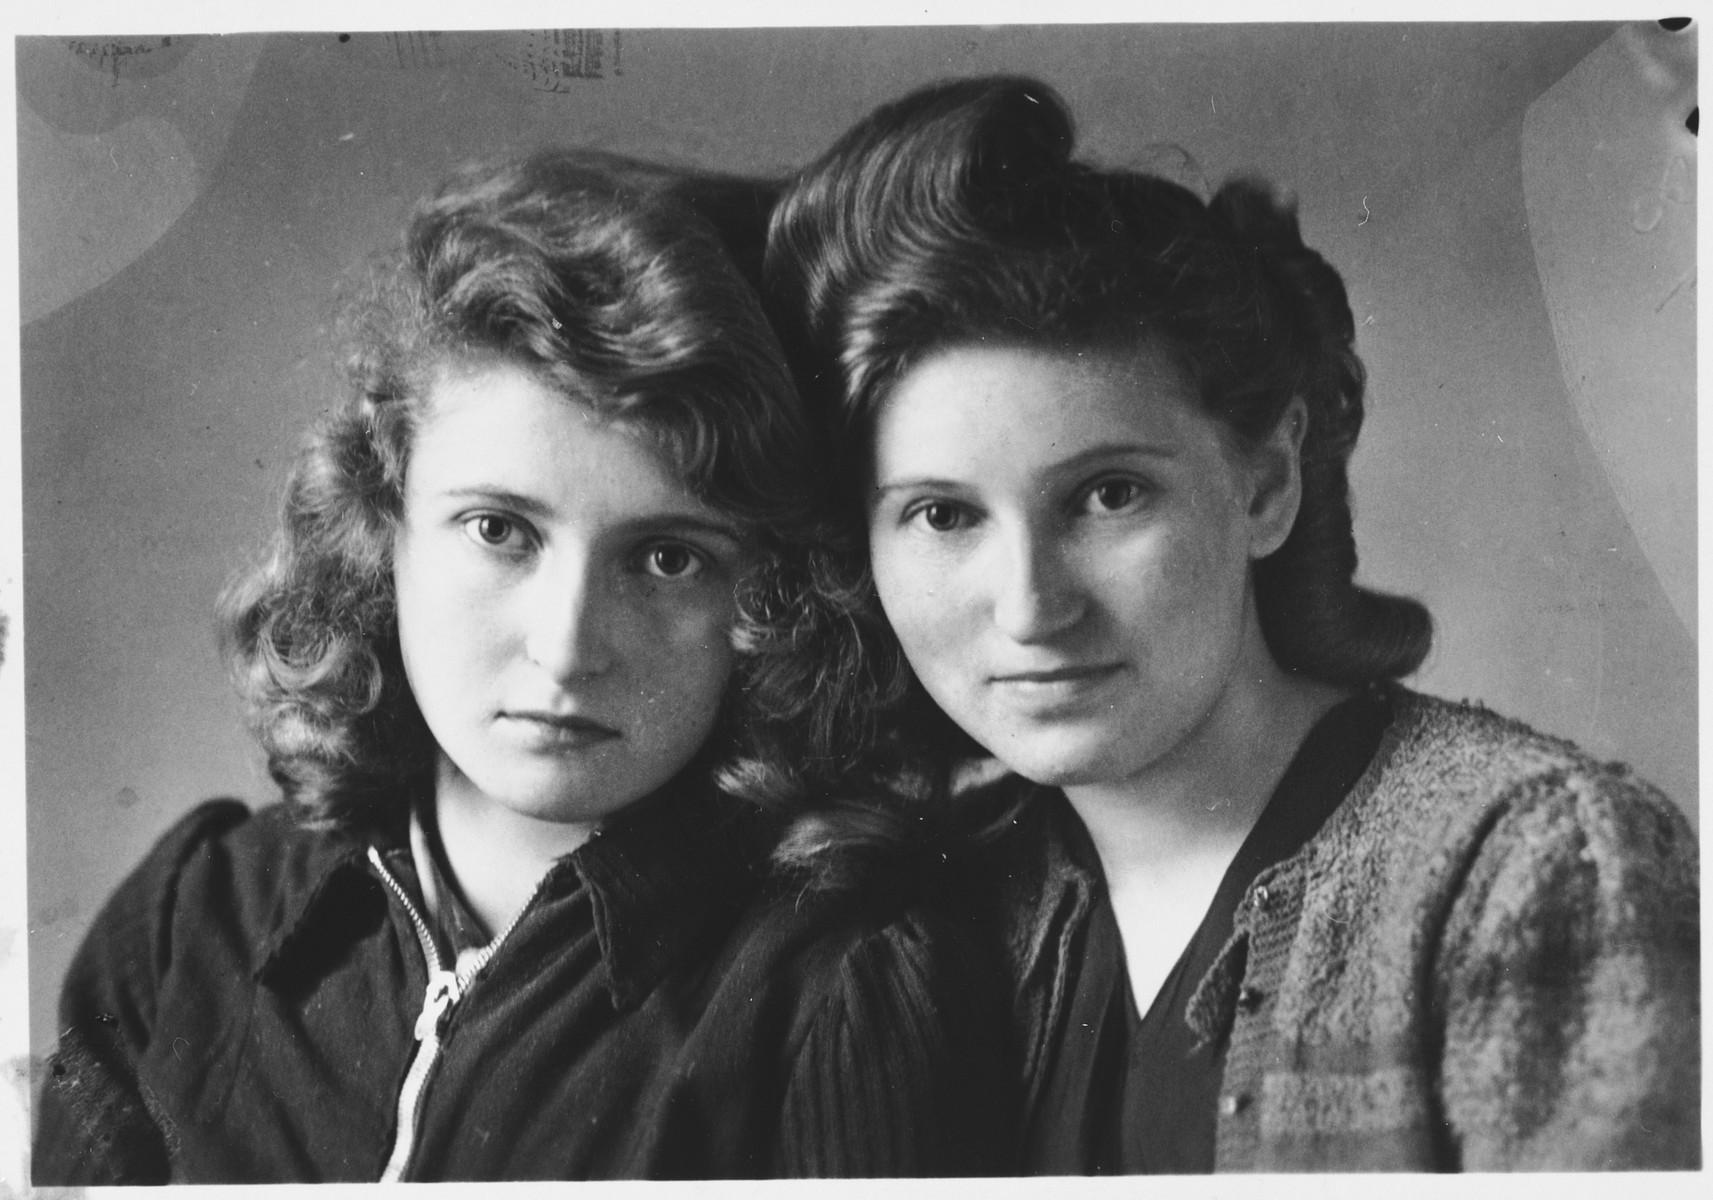 Marysia and Krysia Huppert, the daughters of Dorota's rescuer, Jerzy Huppert.